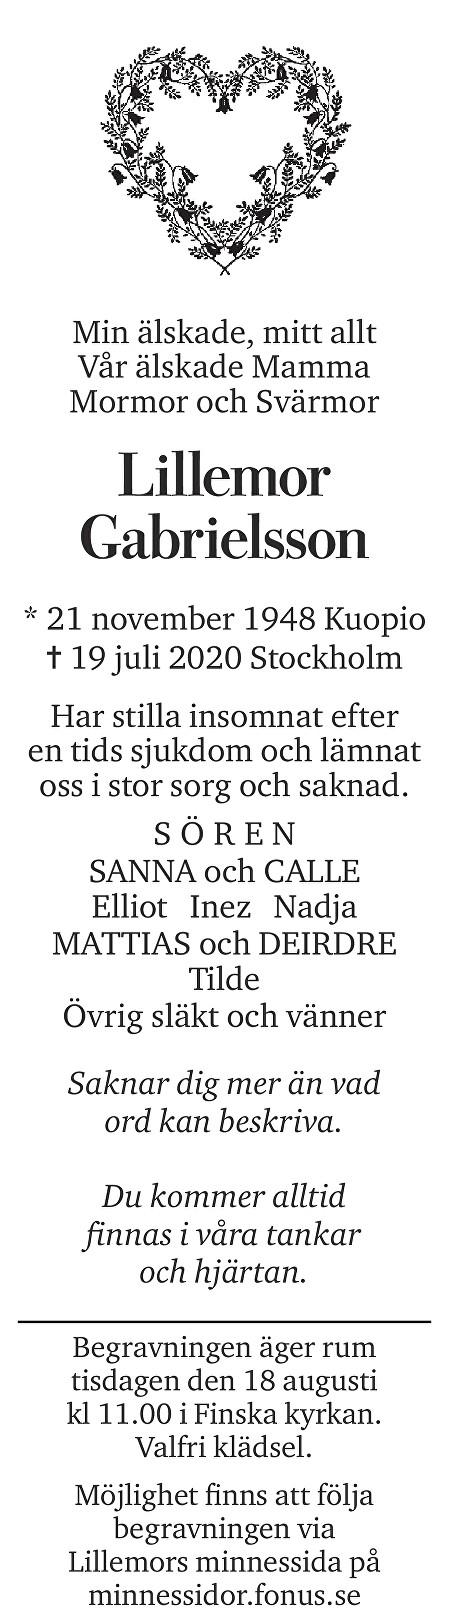 Lillemor Gabrielsson Death notice